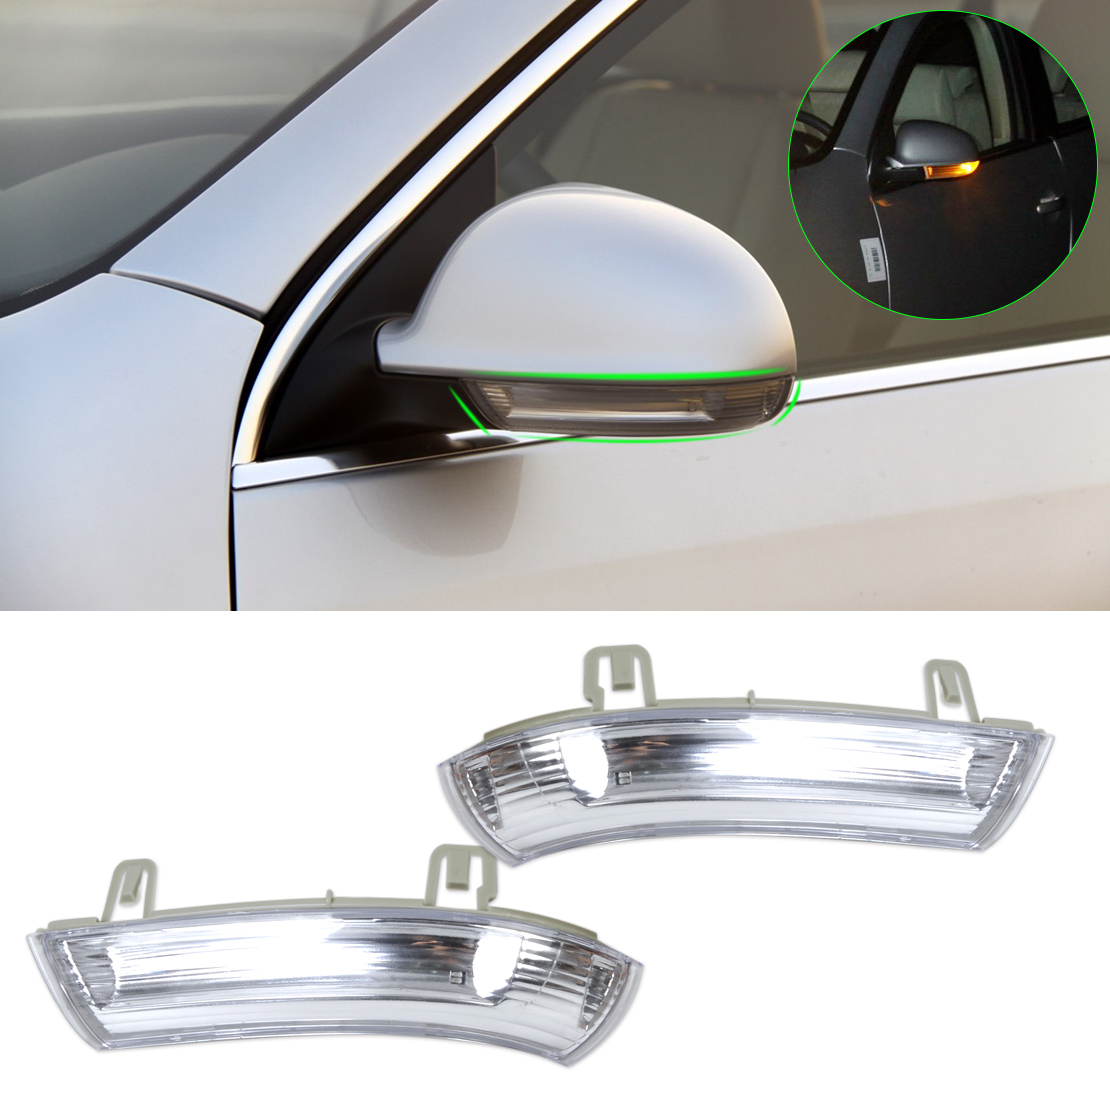 DWCX New Car Oyster Gray Left & Right Door Mirror Turn Signal Light 1K0949101 / 1K0949102 for Volkswagen VW JETTA MK5 PASSAT